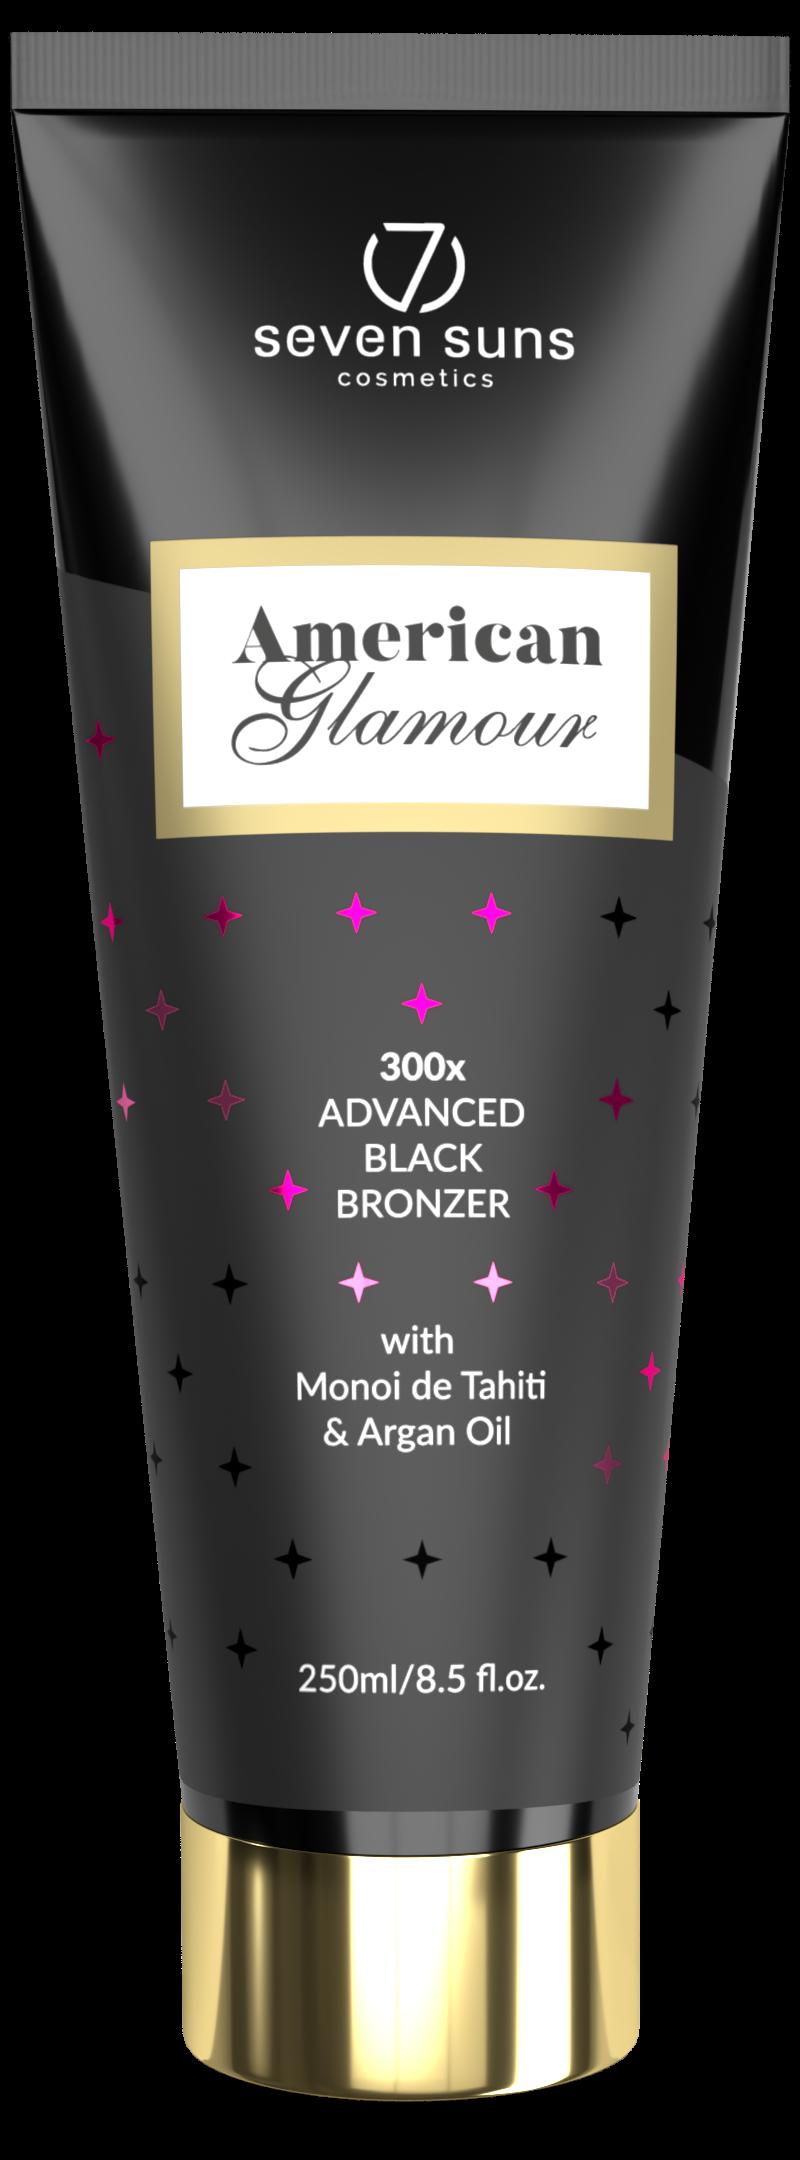 American Glamour bronzer tube